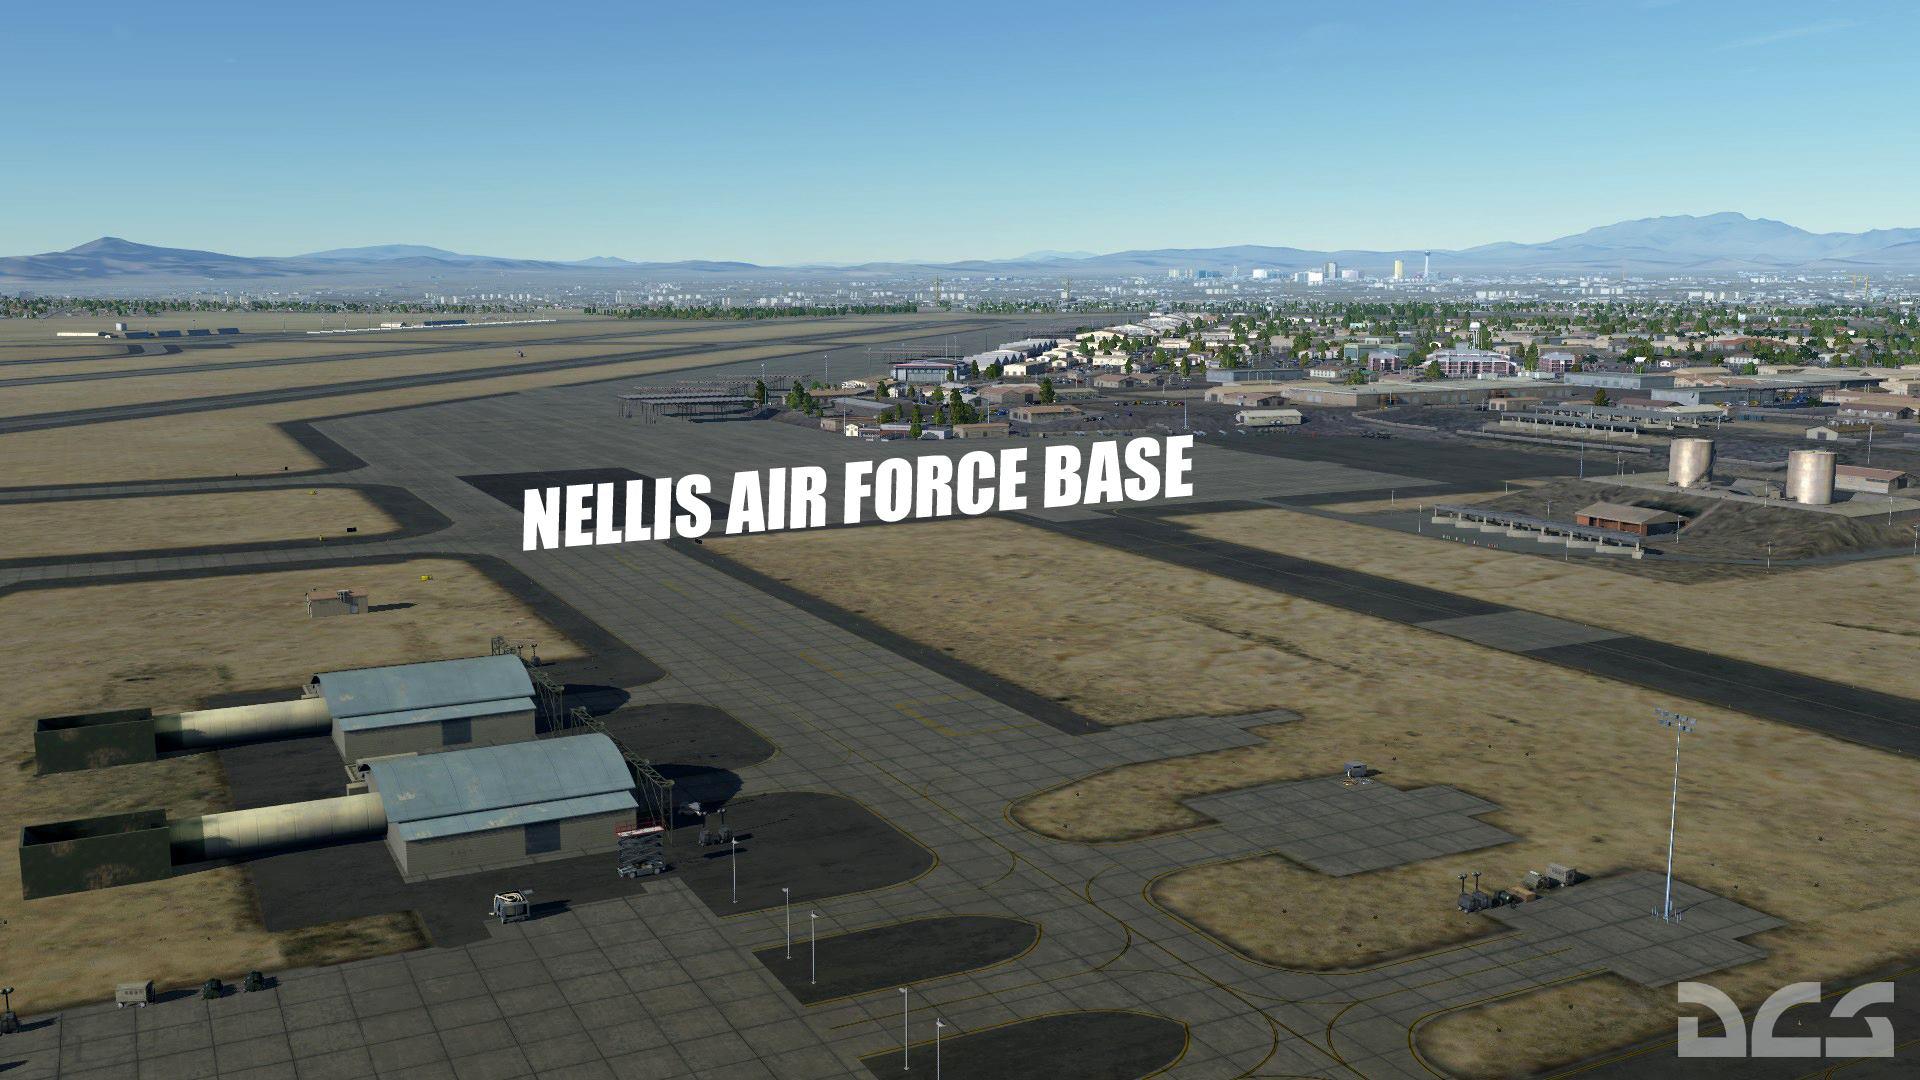 DCS: NEVADA Test and Training Range Map screenshot